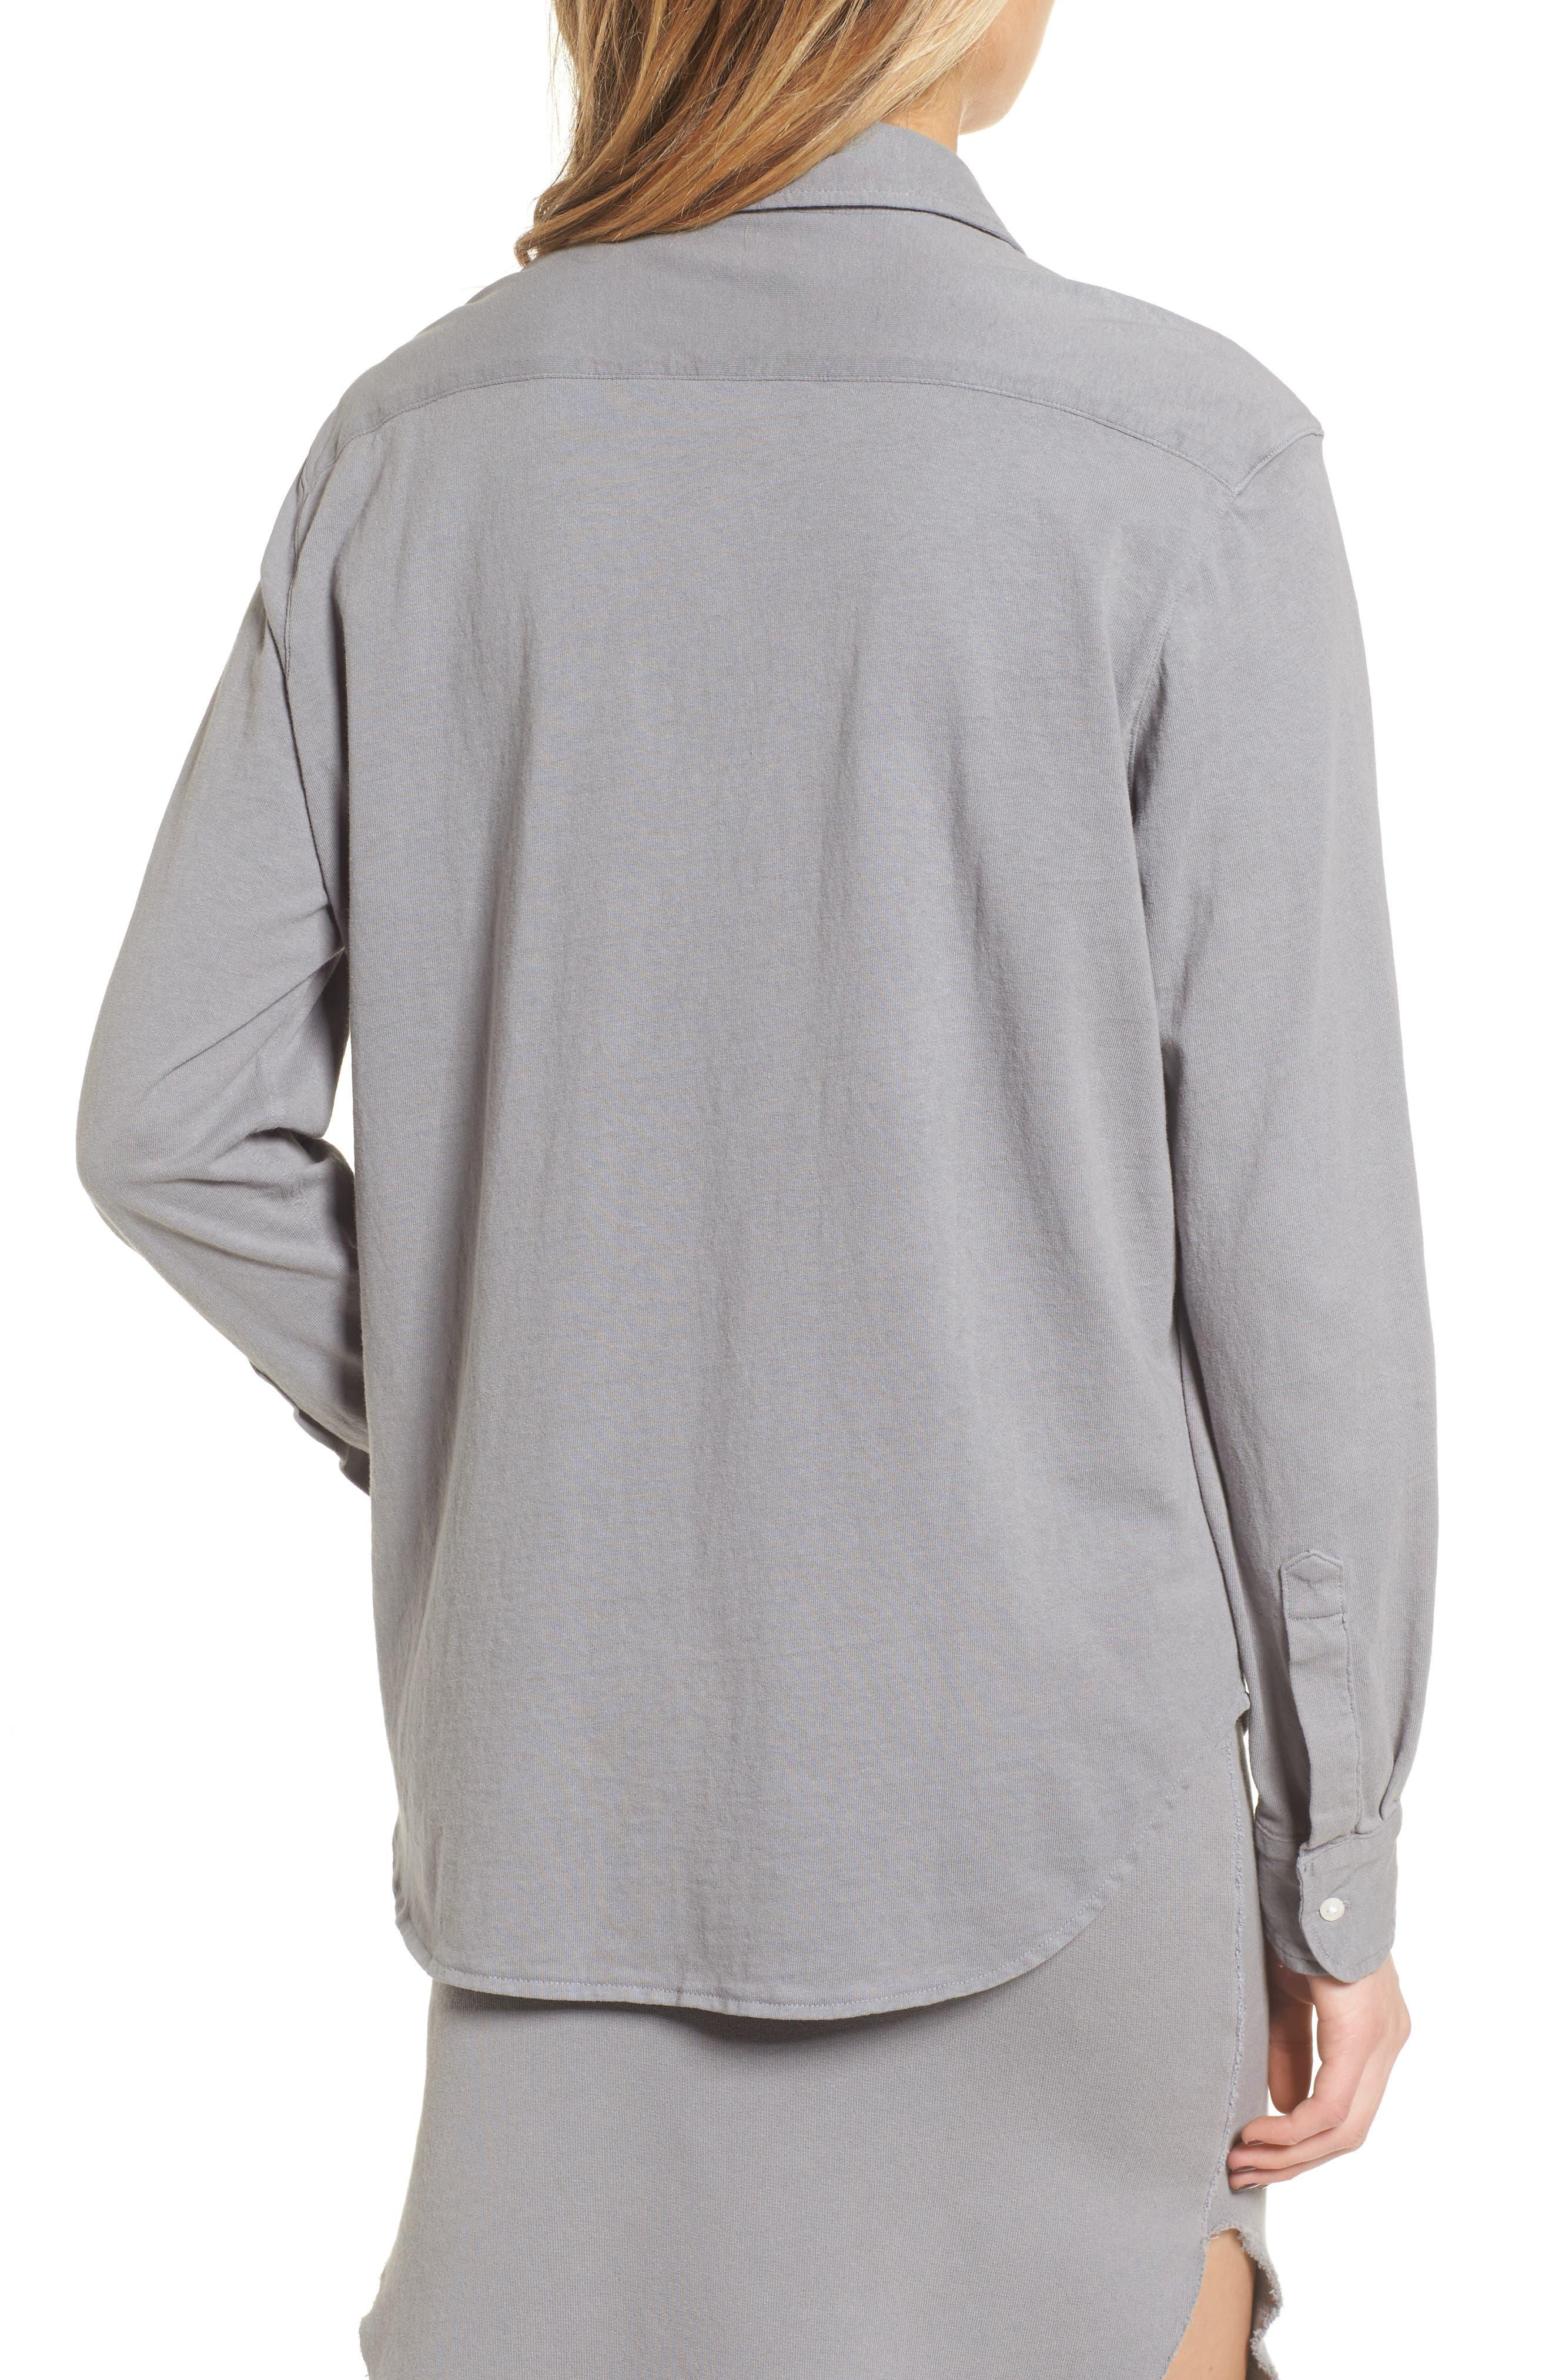 Tee Lab Knit Button Down Shirt,                             Alternate thumbnail 2, color,                             037